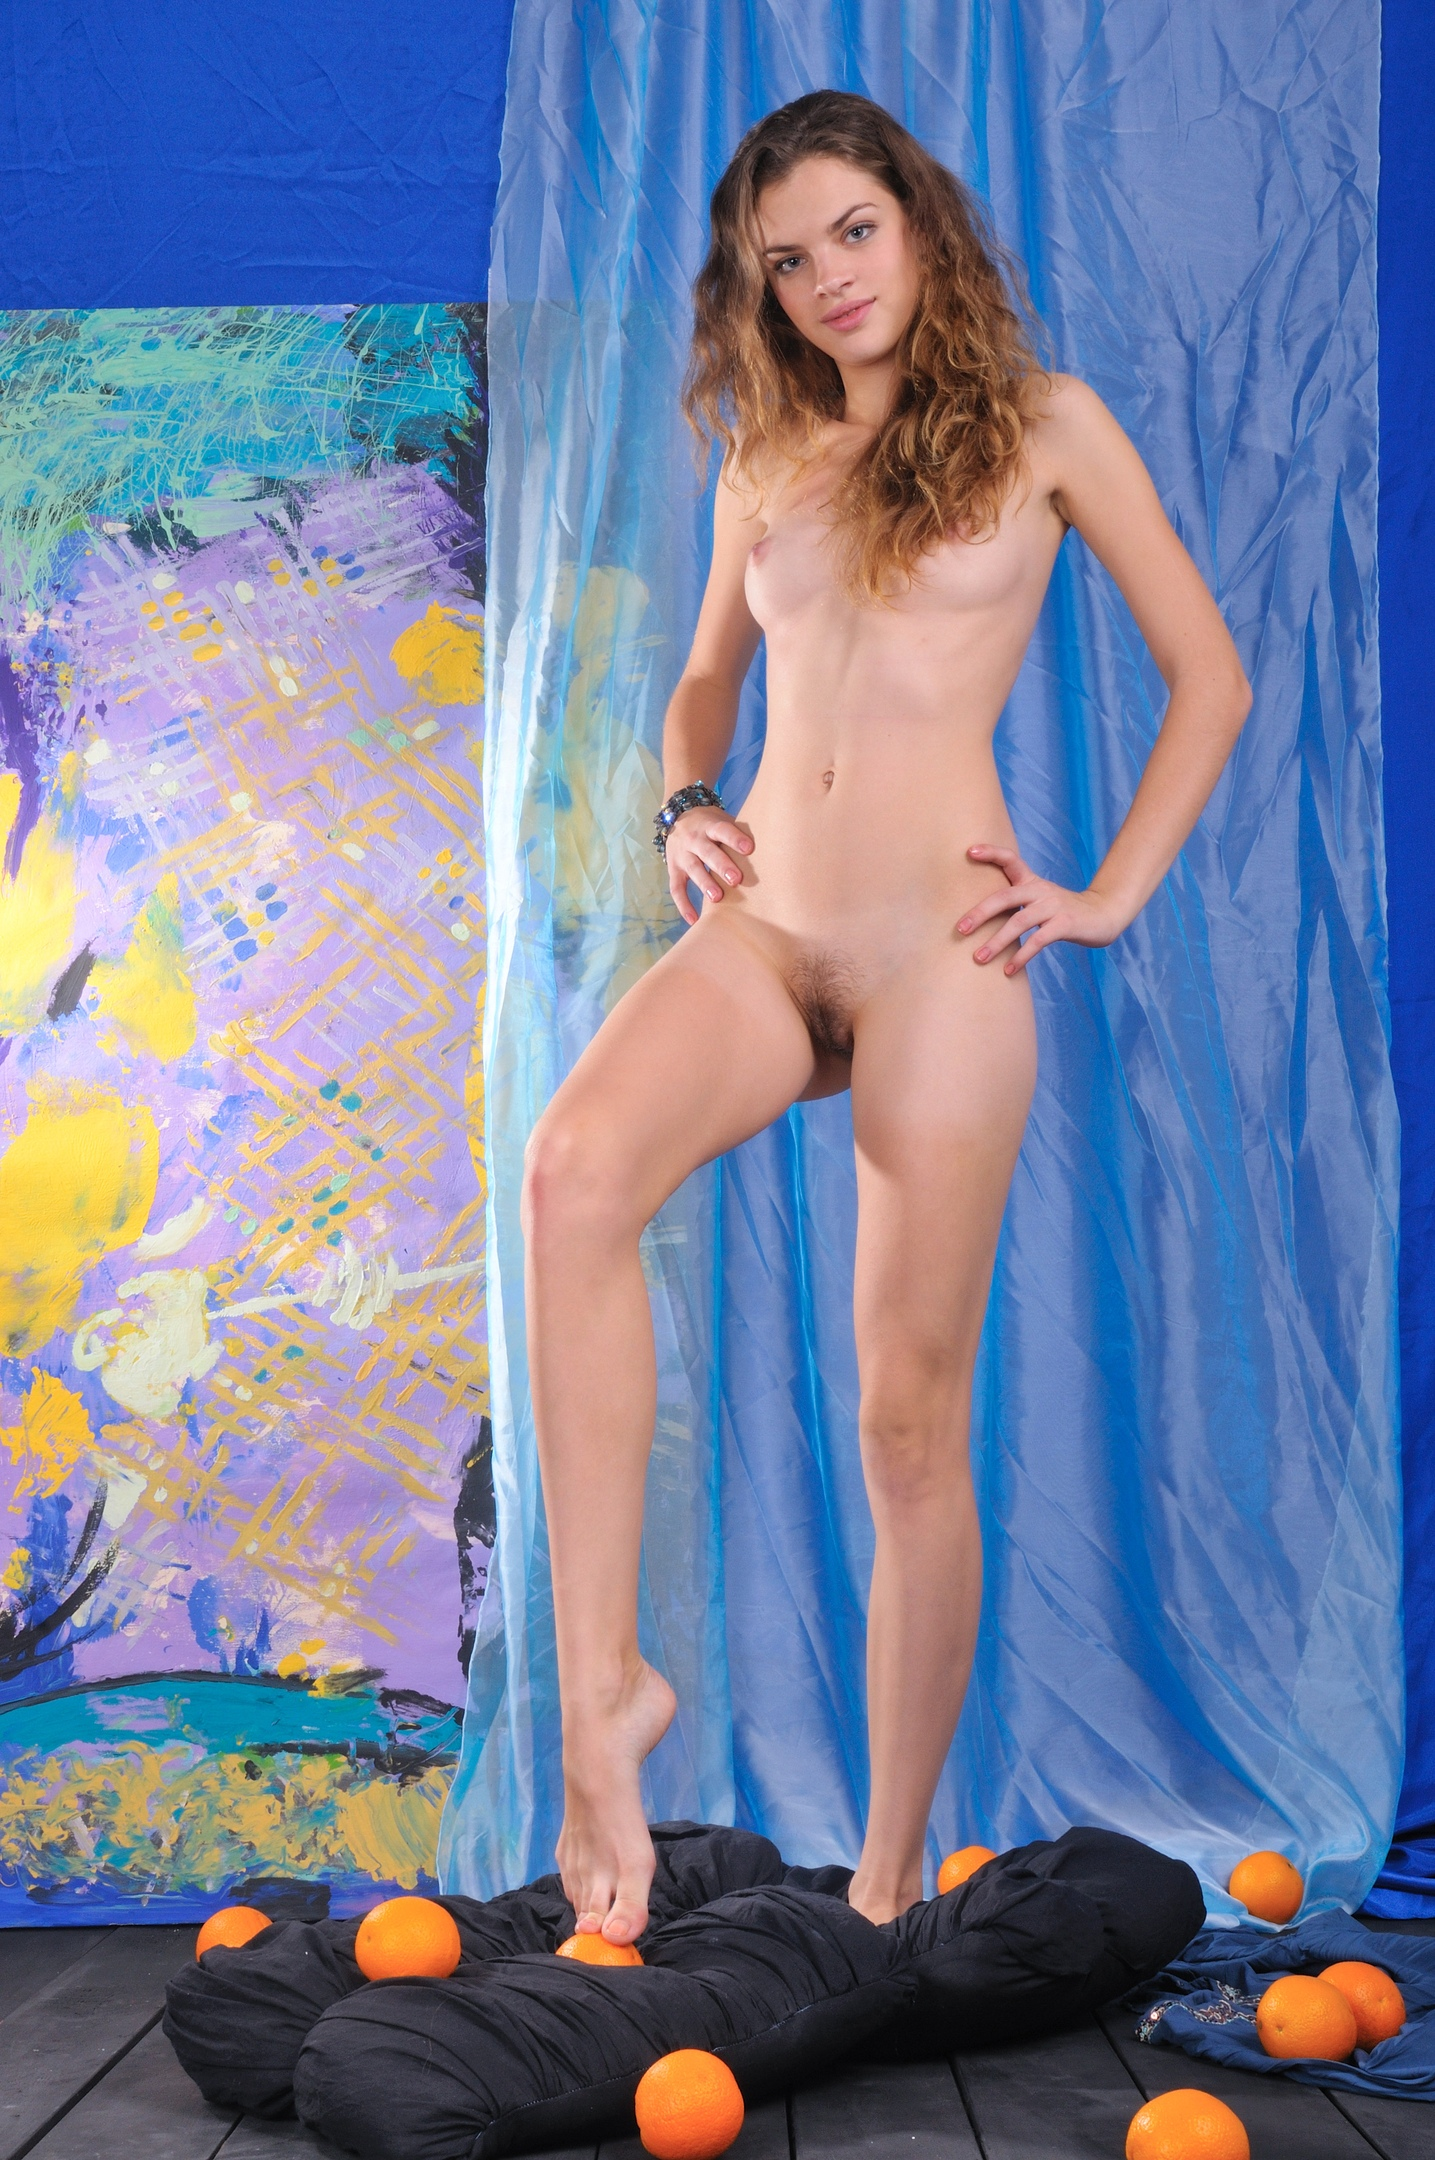 Модель: Susanna A (Deannniy, Bernie Svintis, Lagoda, Martha F)